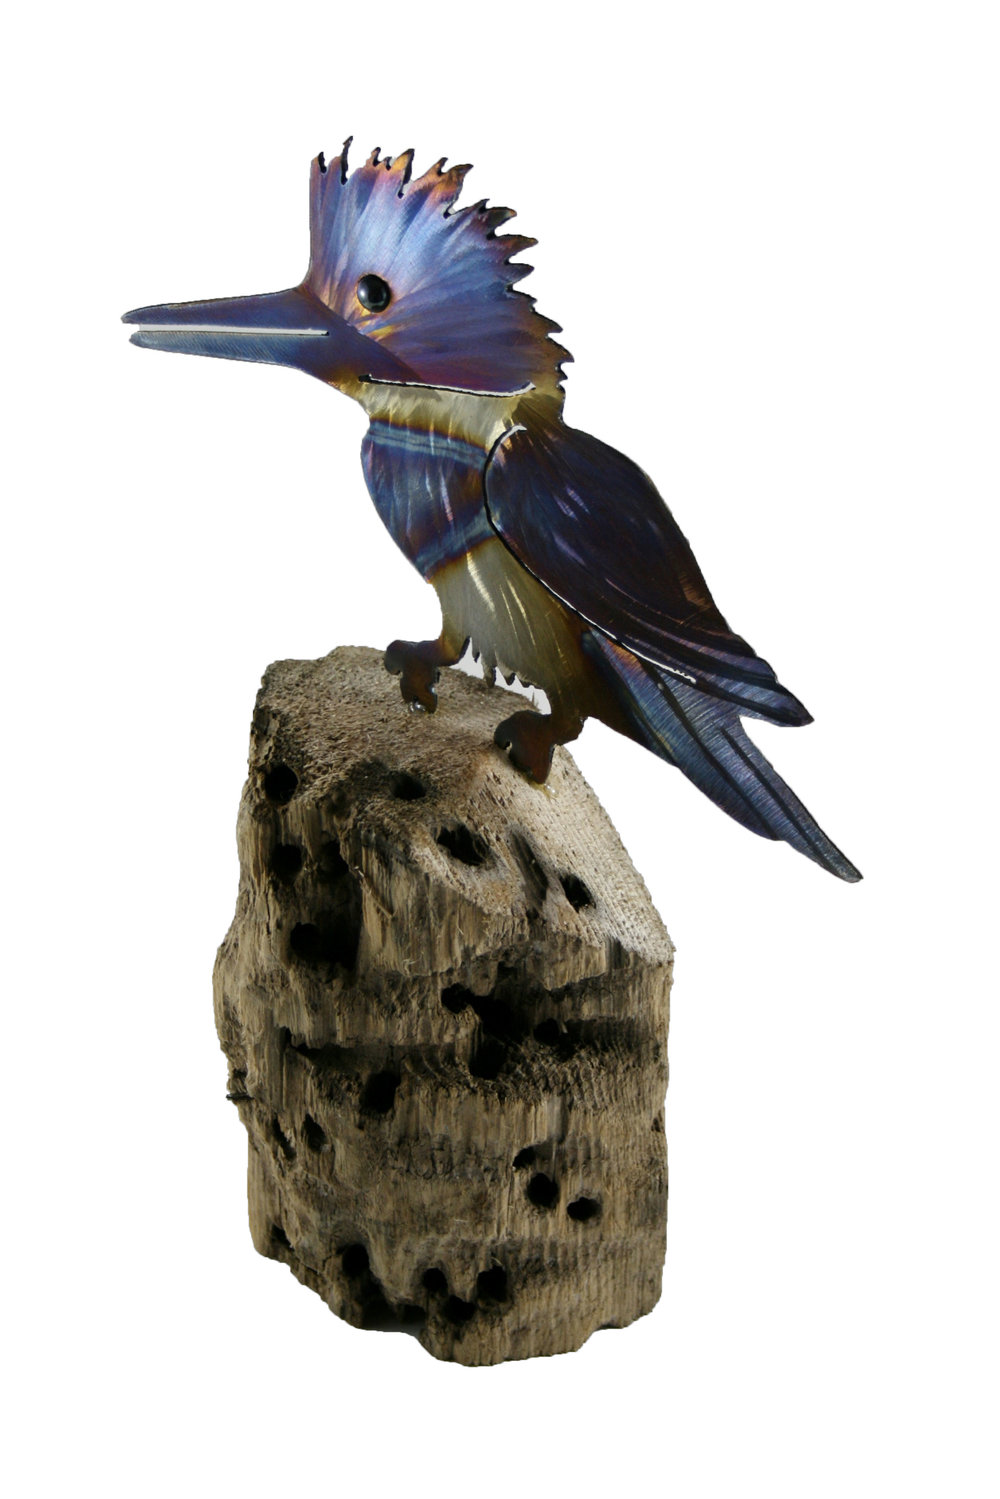 kingfisher 2 kevin mckenzie.jpg